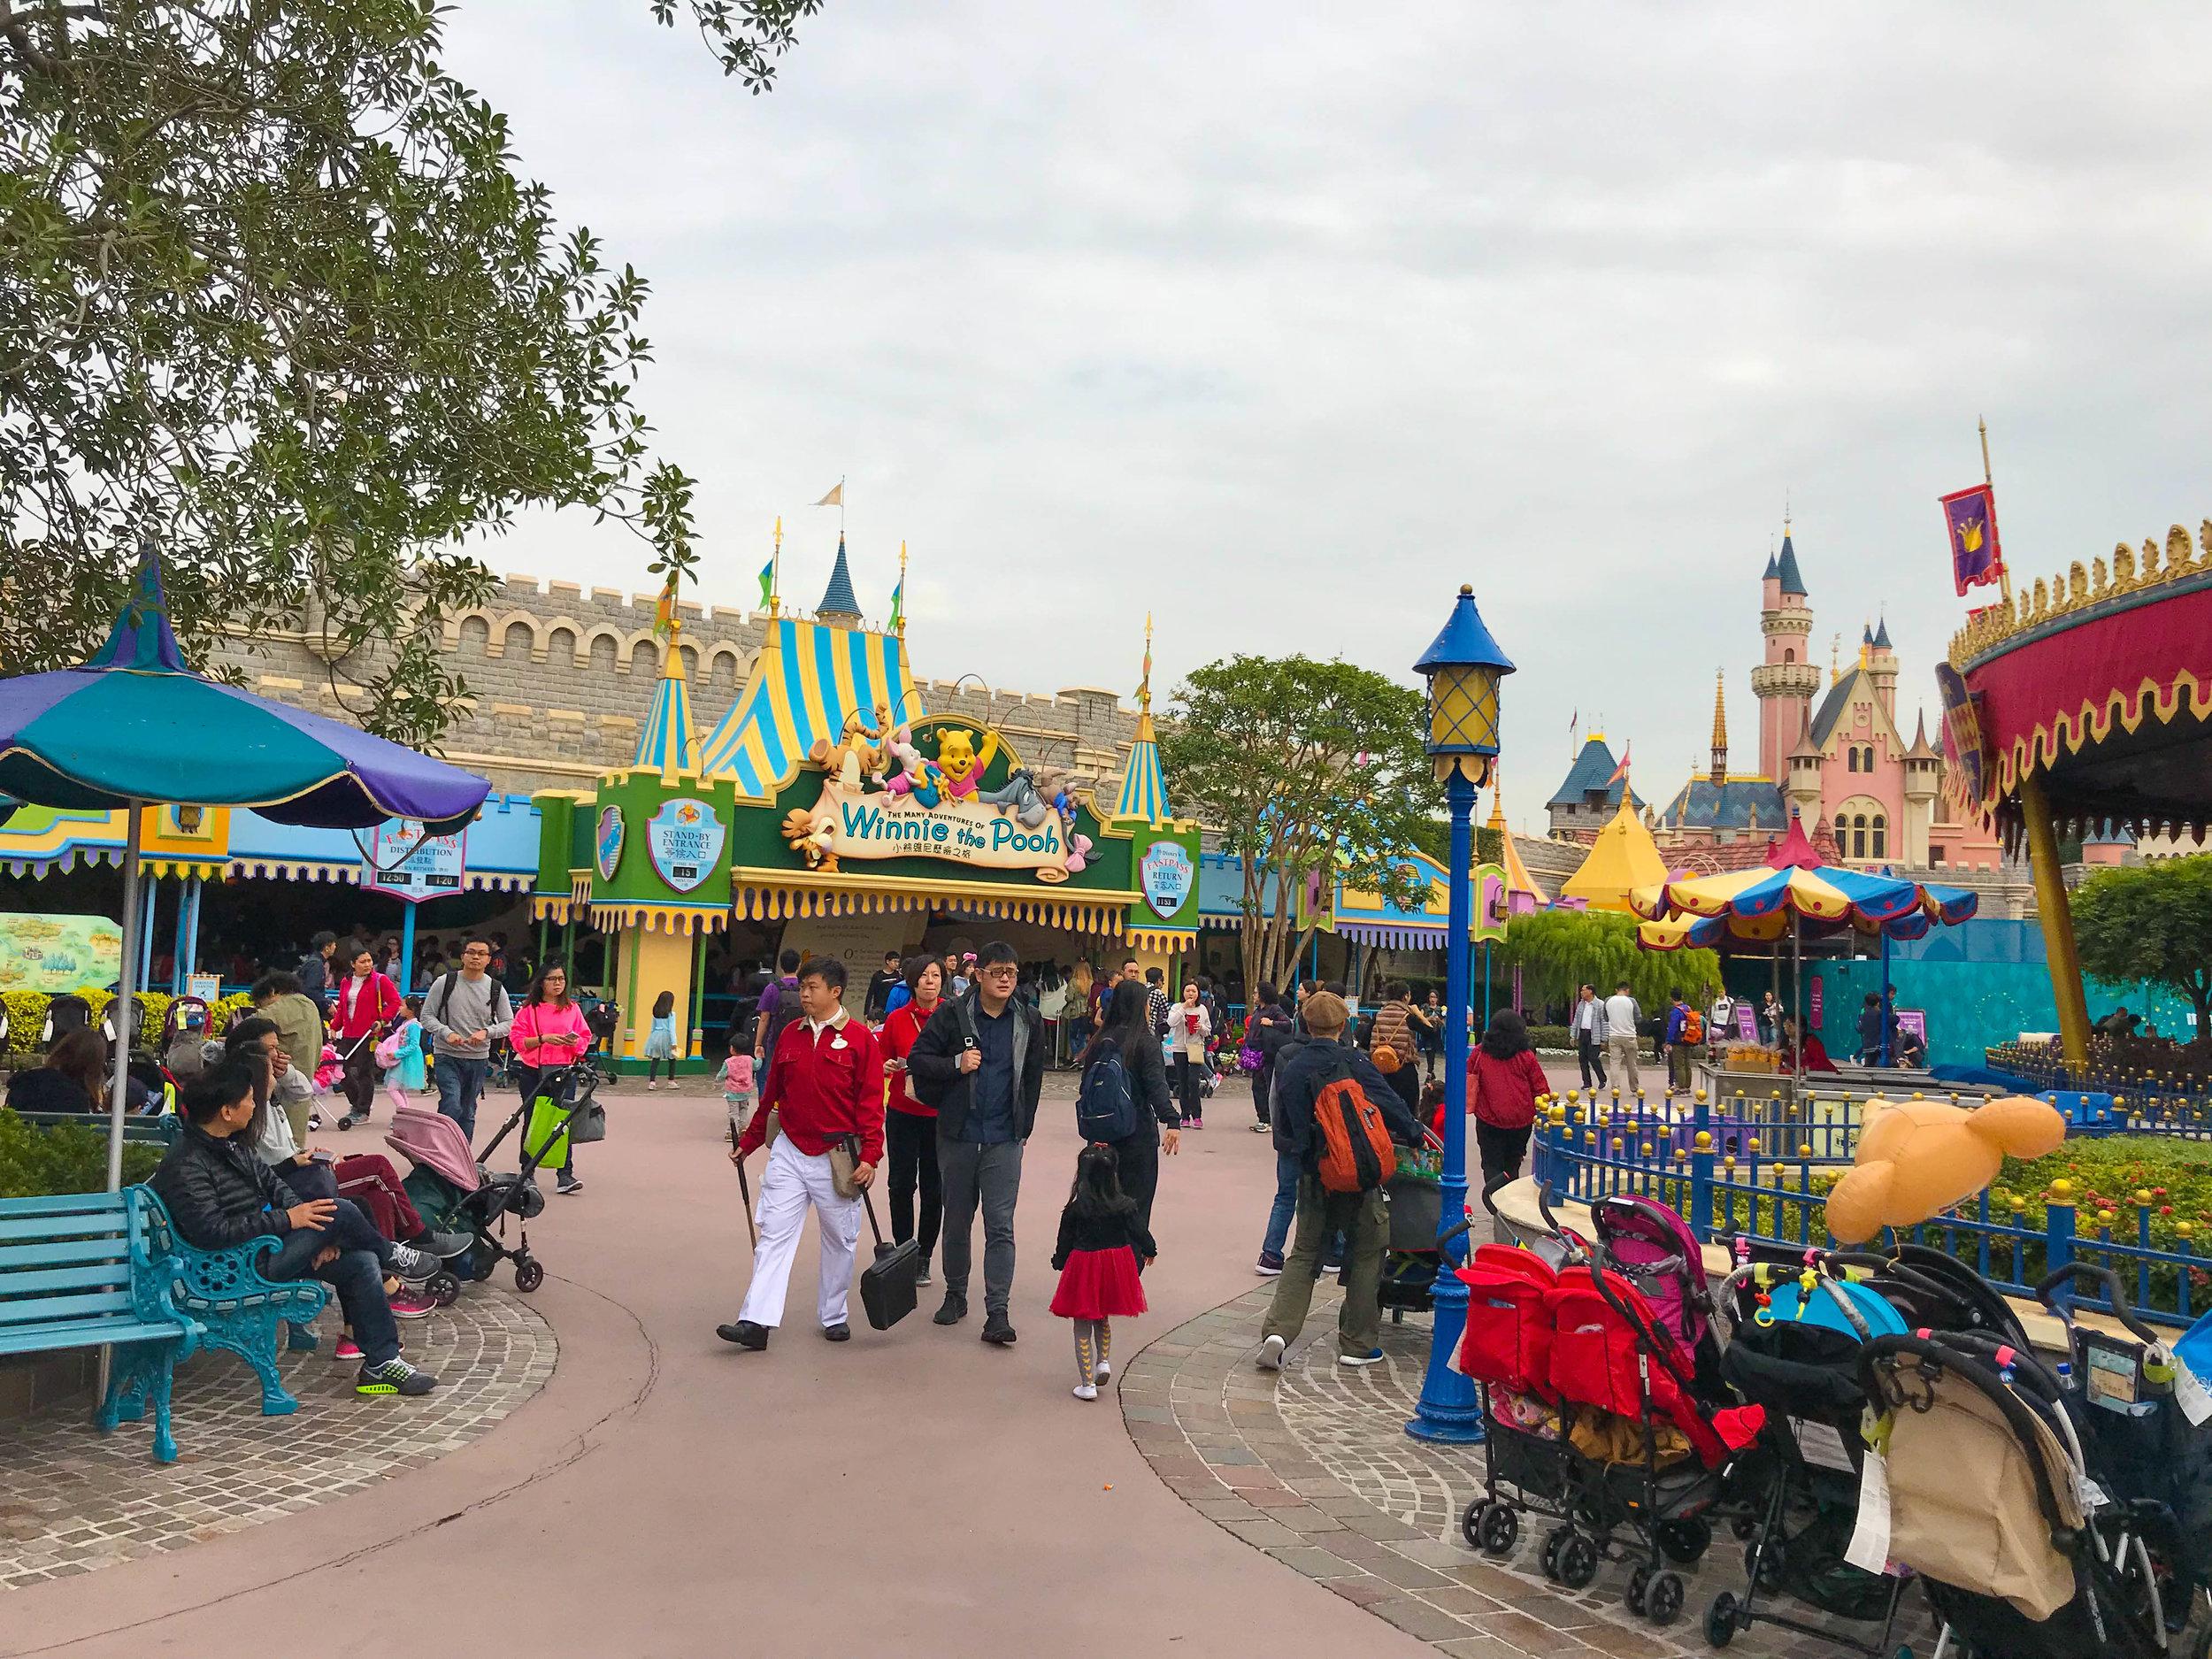 Hong Kong Disneyland - Fantasyland